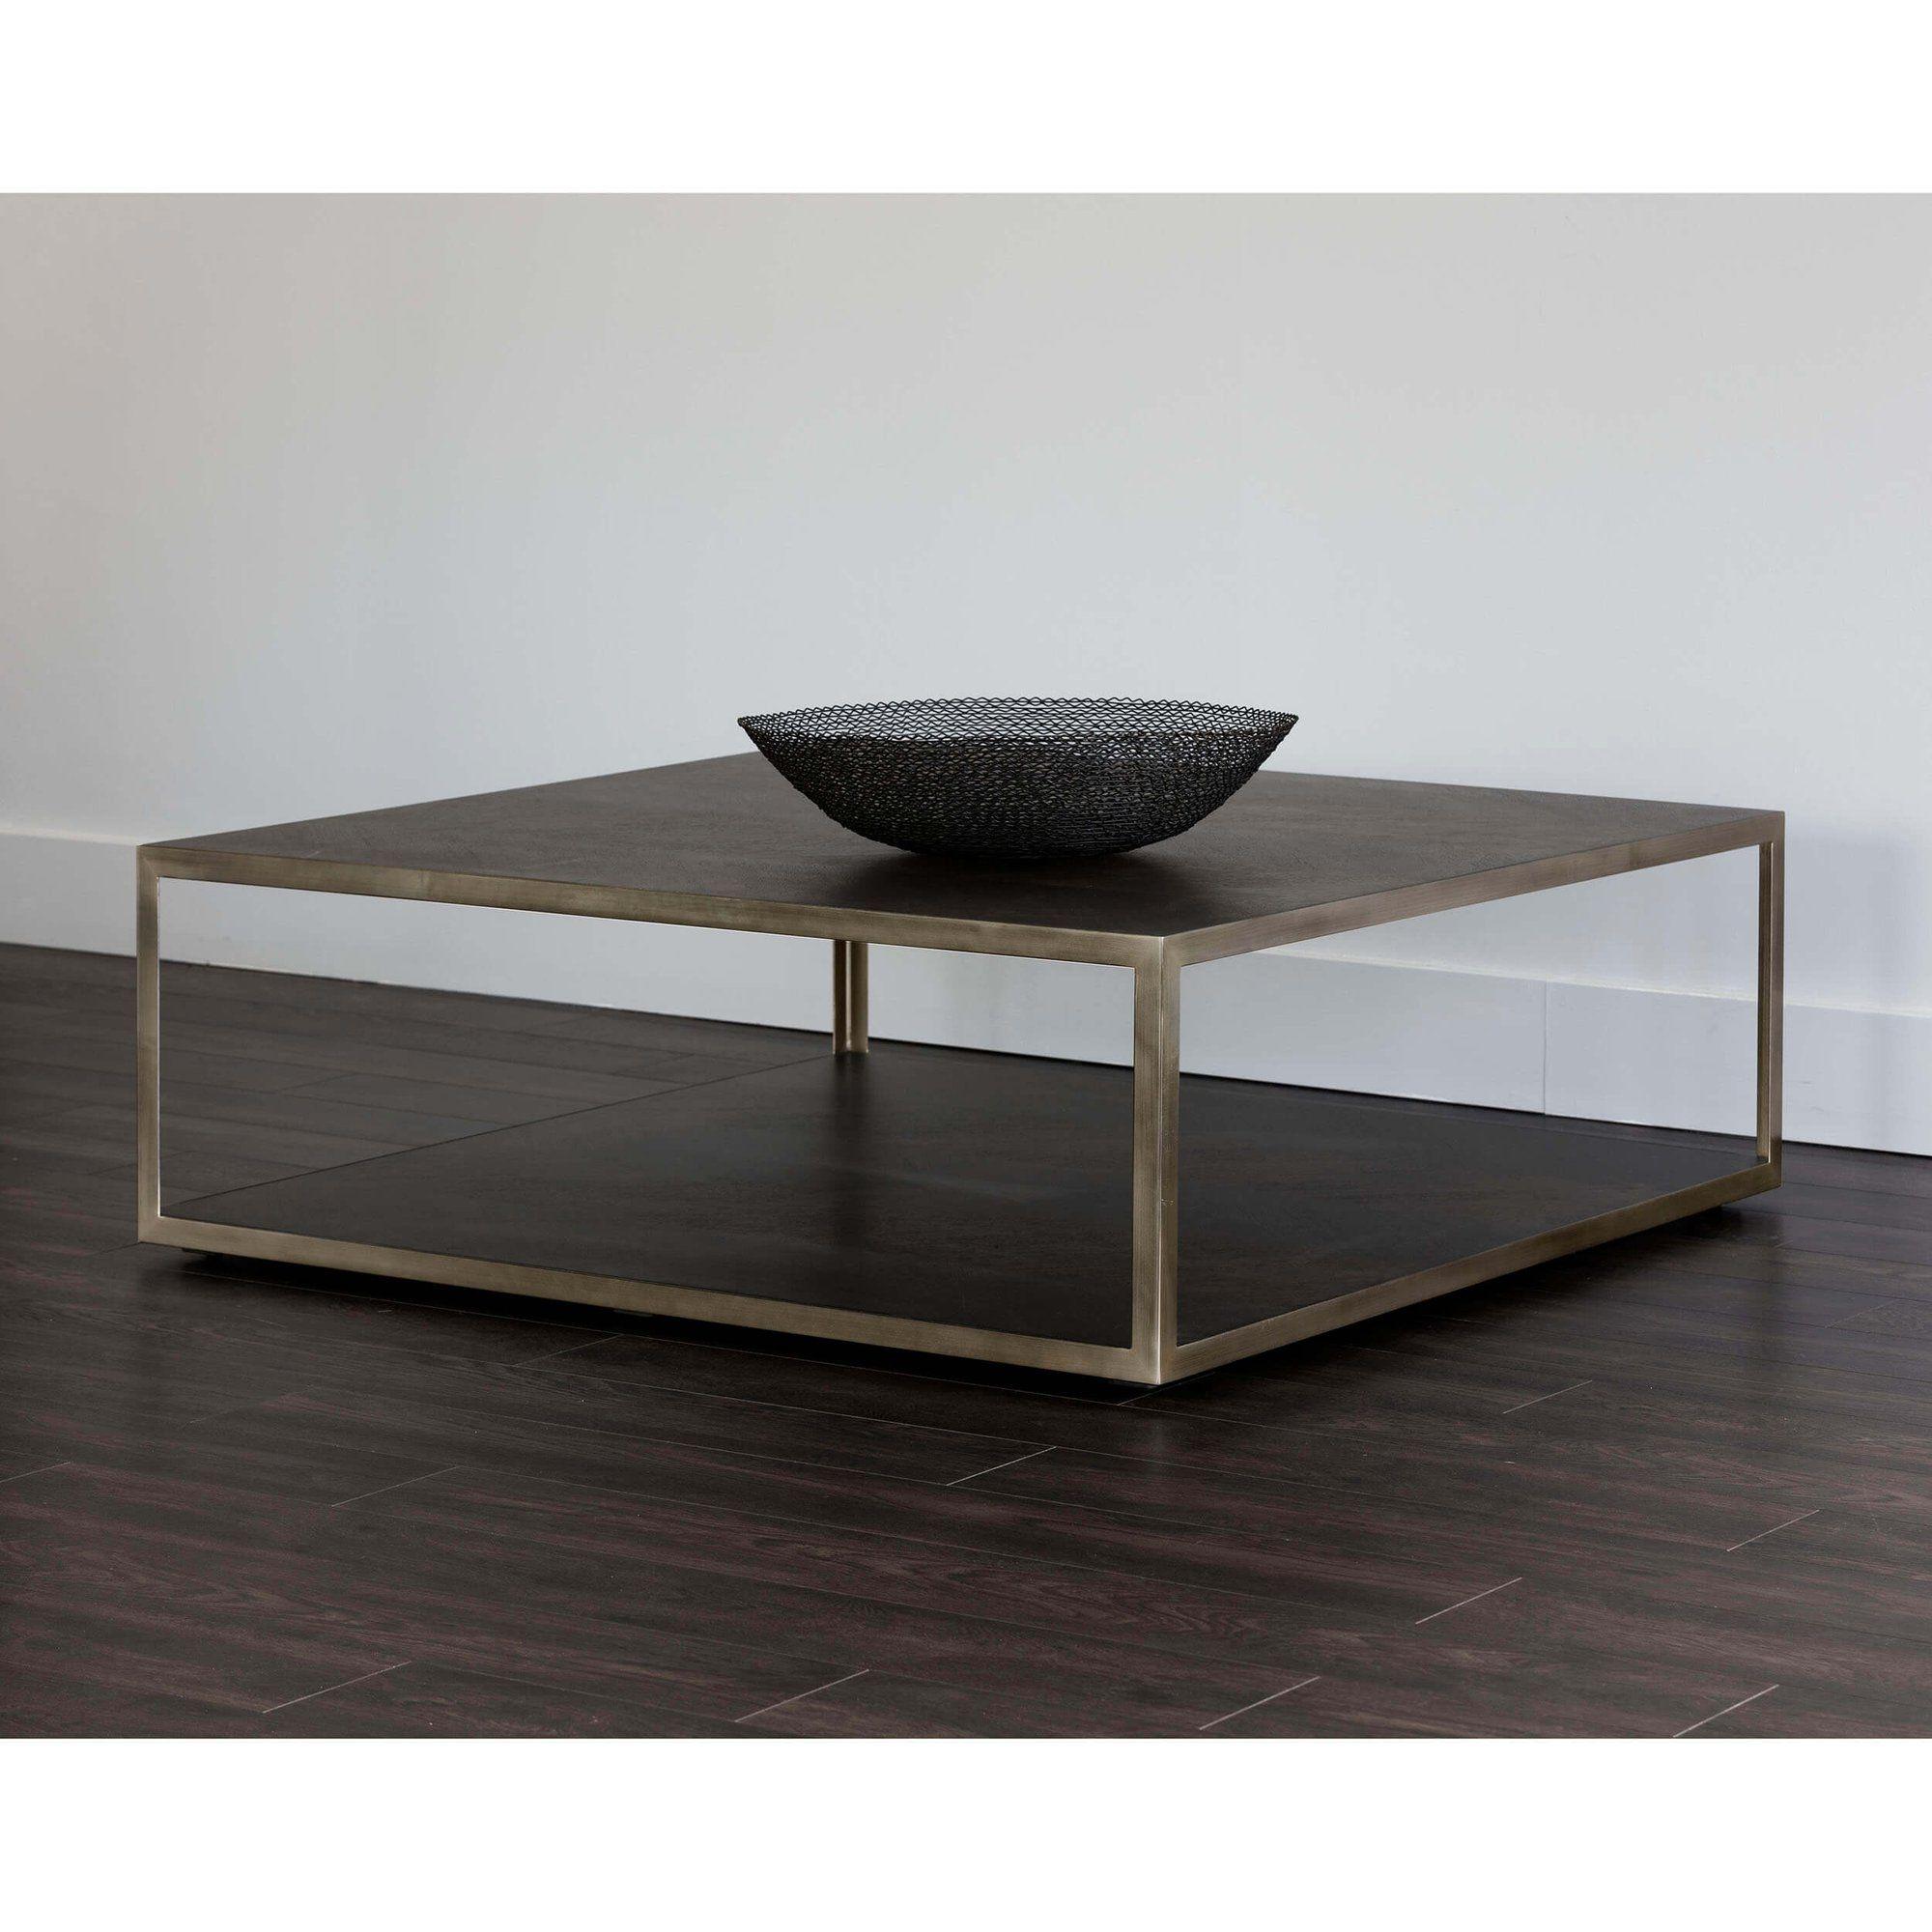 Mara Coffee Table Square Smoked Mocha Large Square Coffee Table Coffee Table Coffee Table Square [ 2000 x 2000 Pixel ]